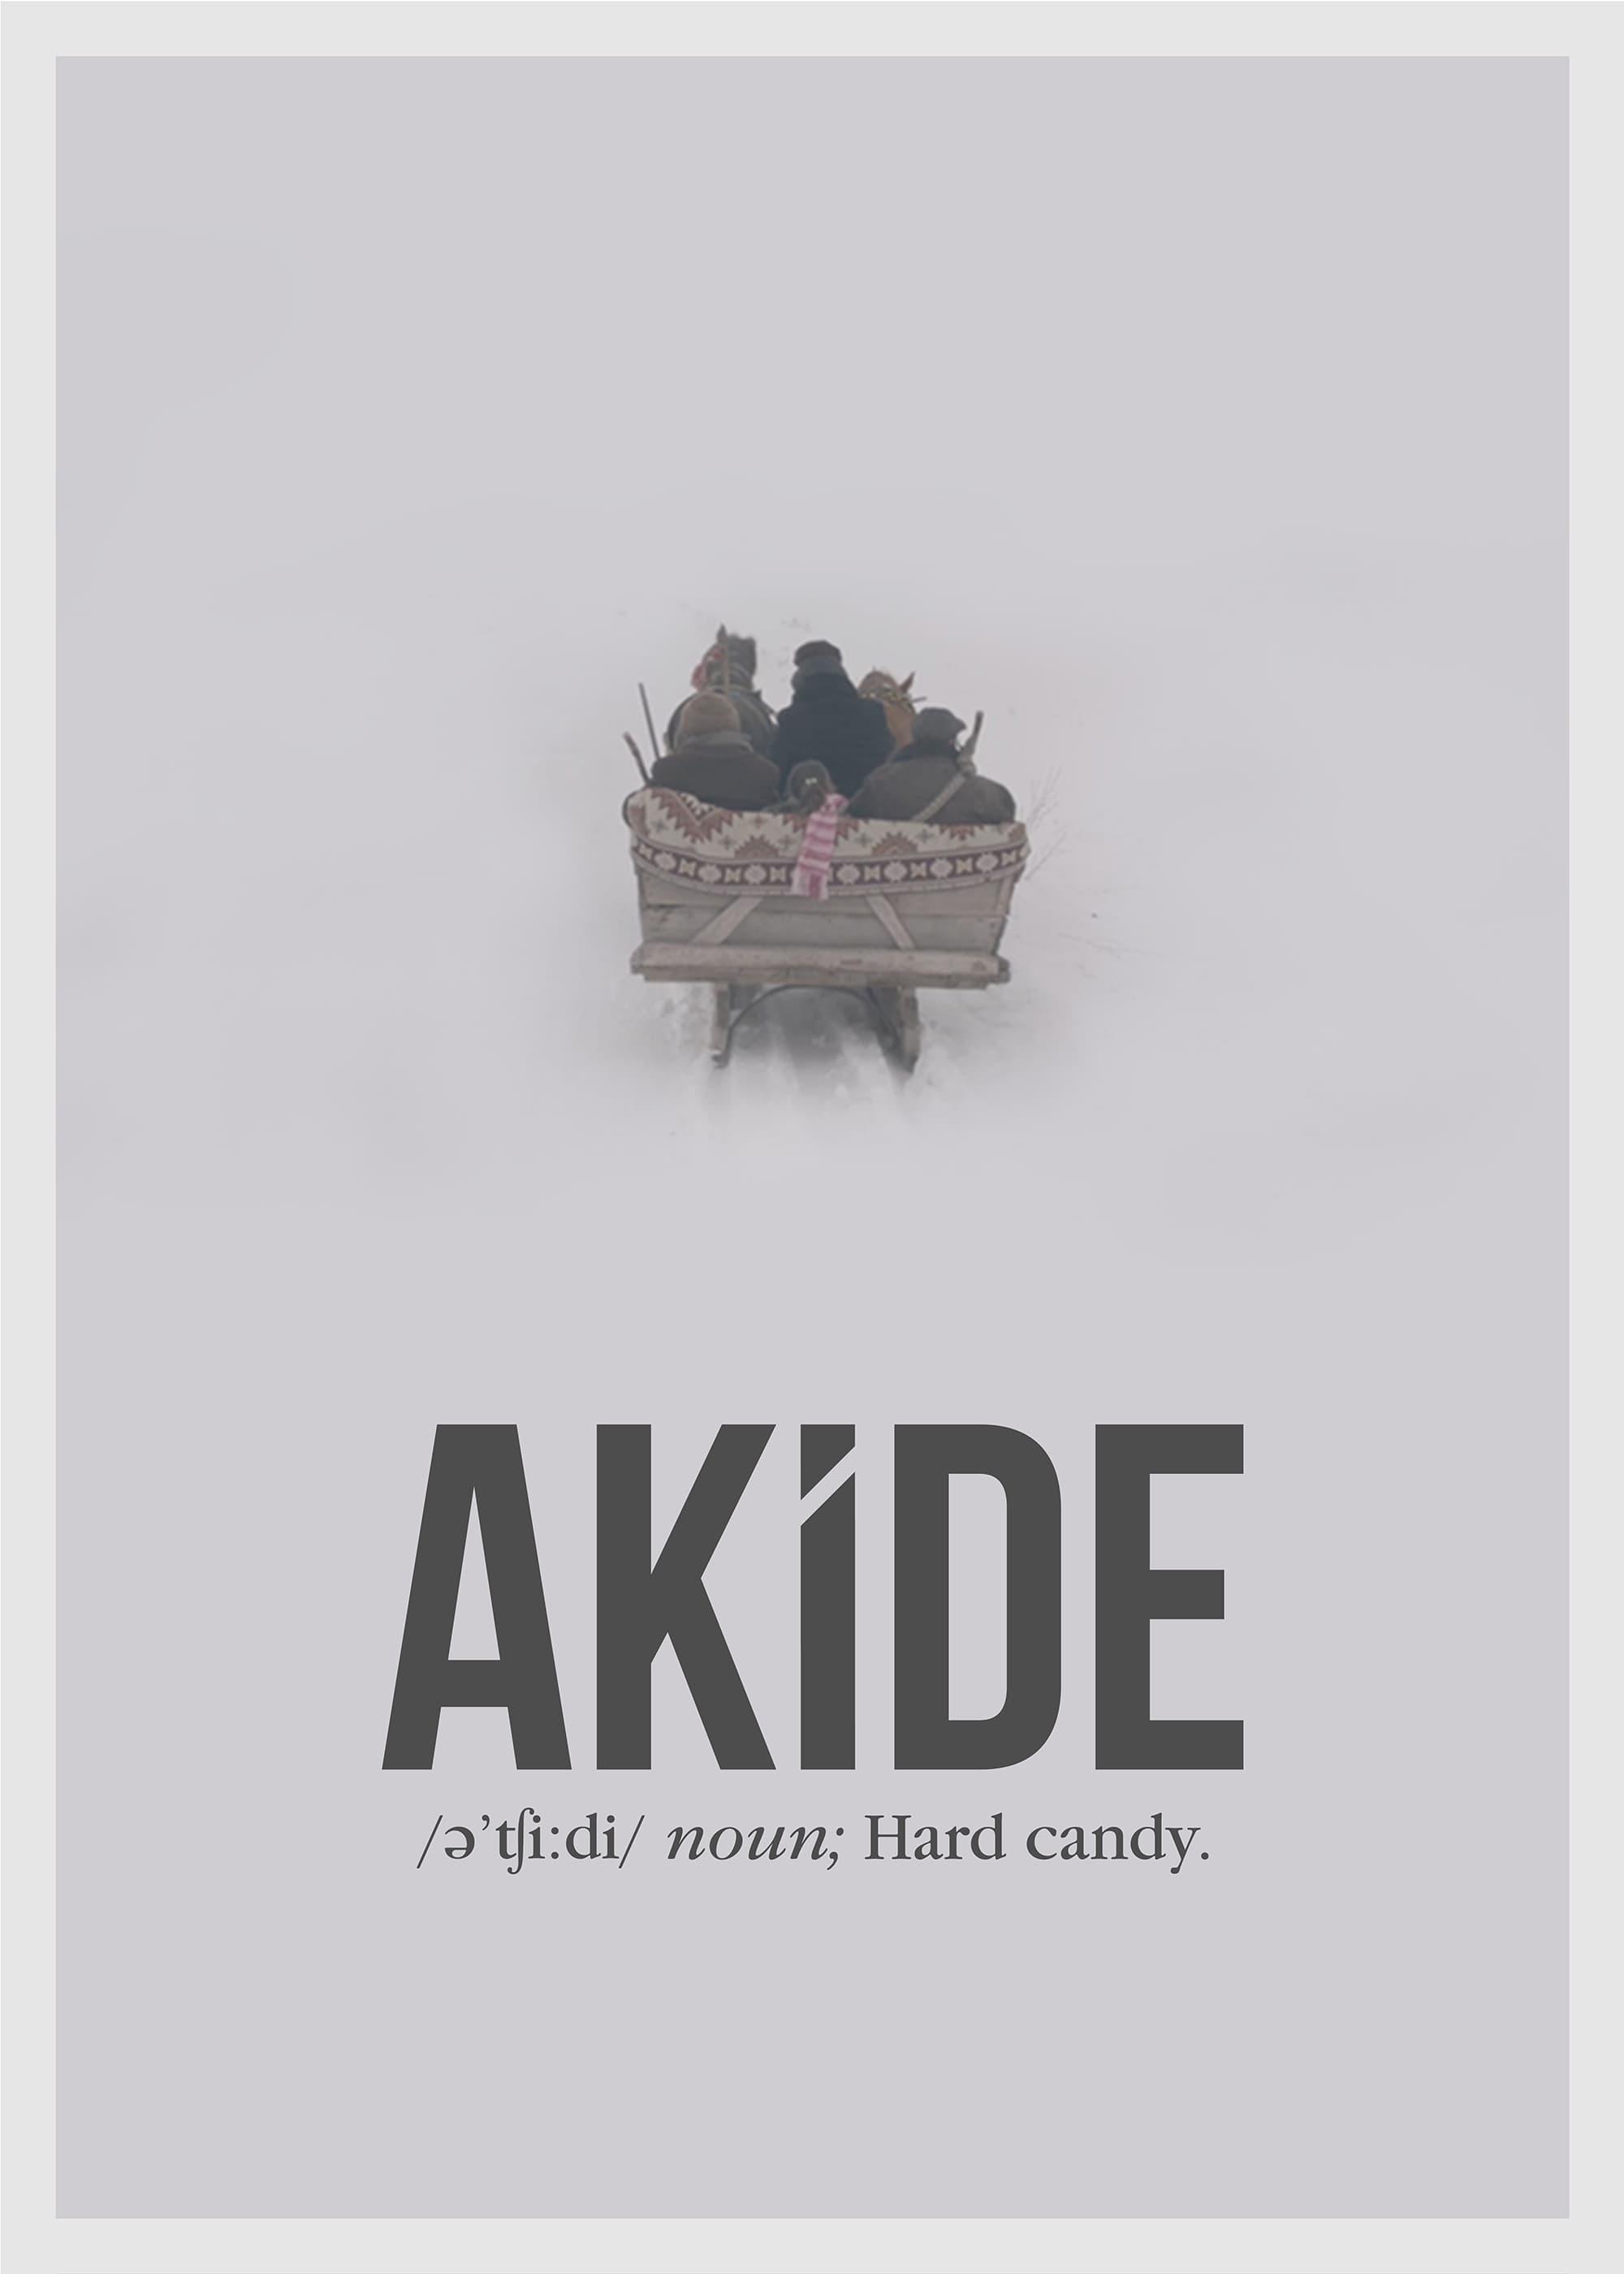 Akide